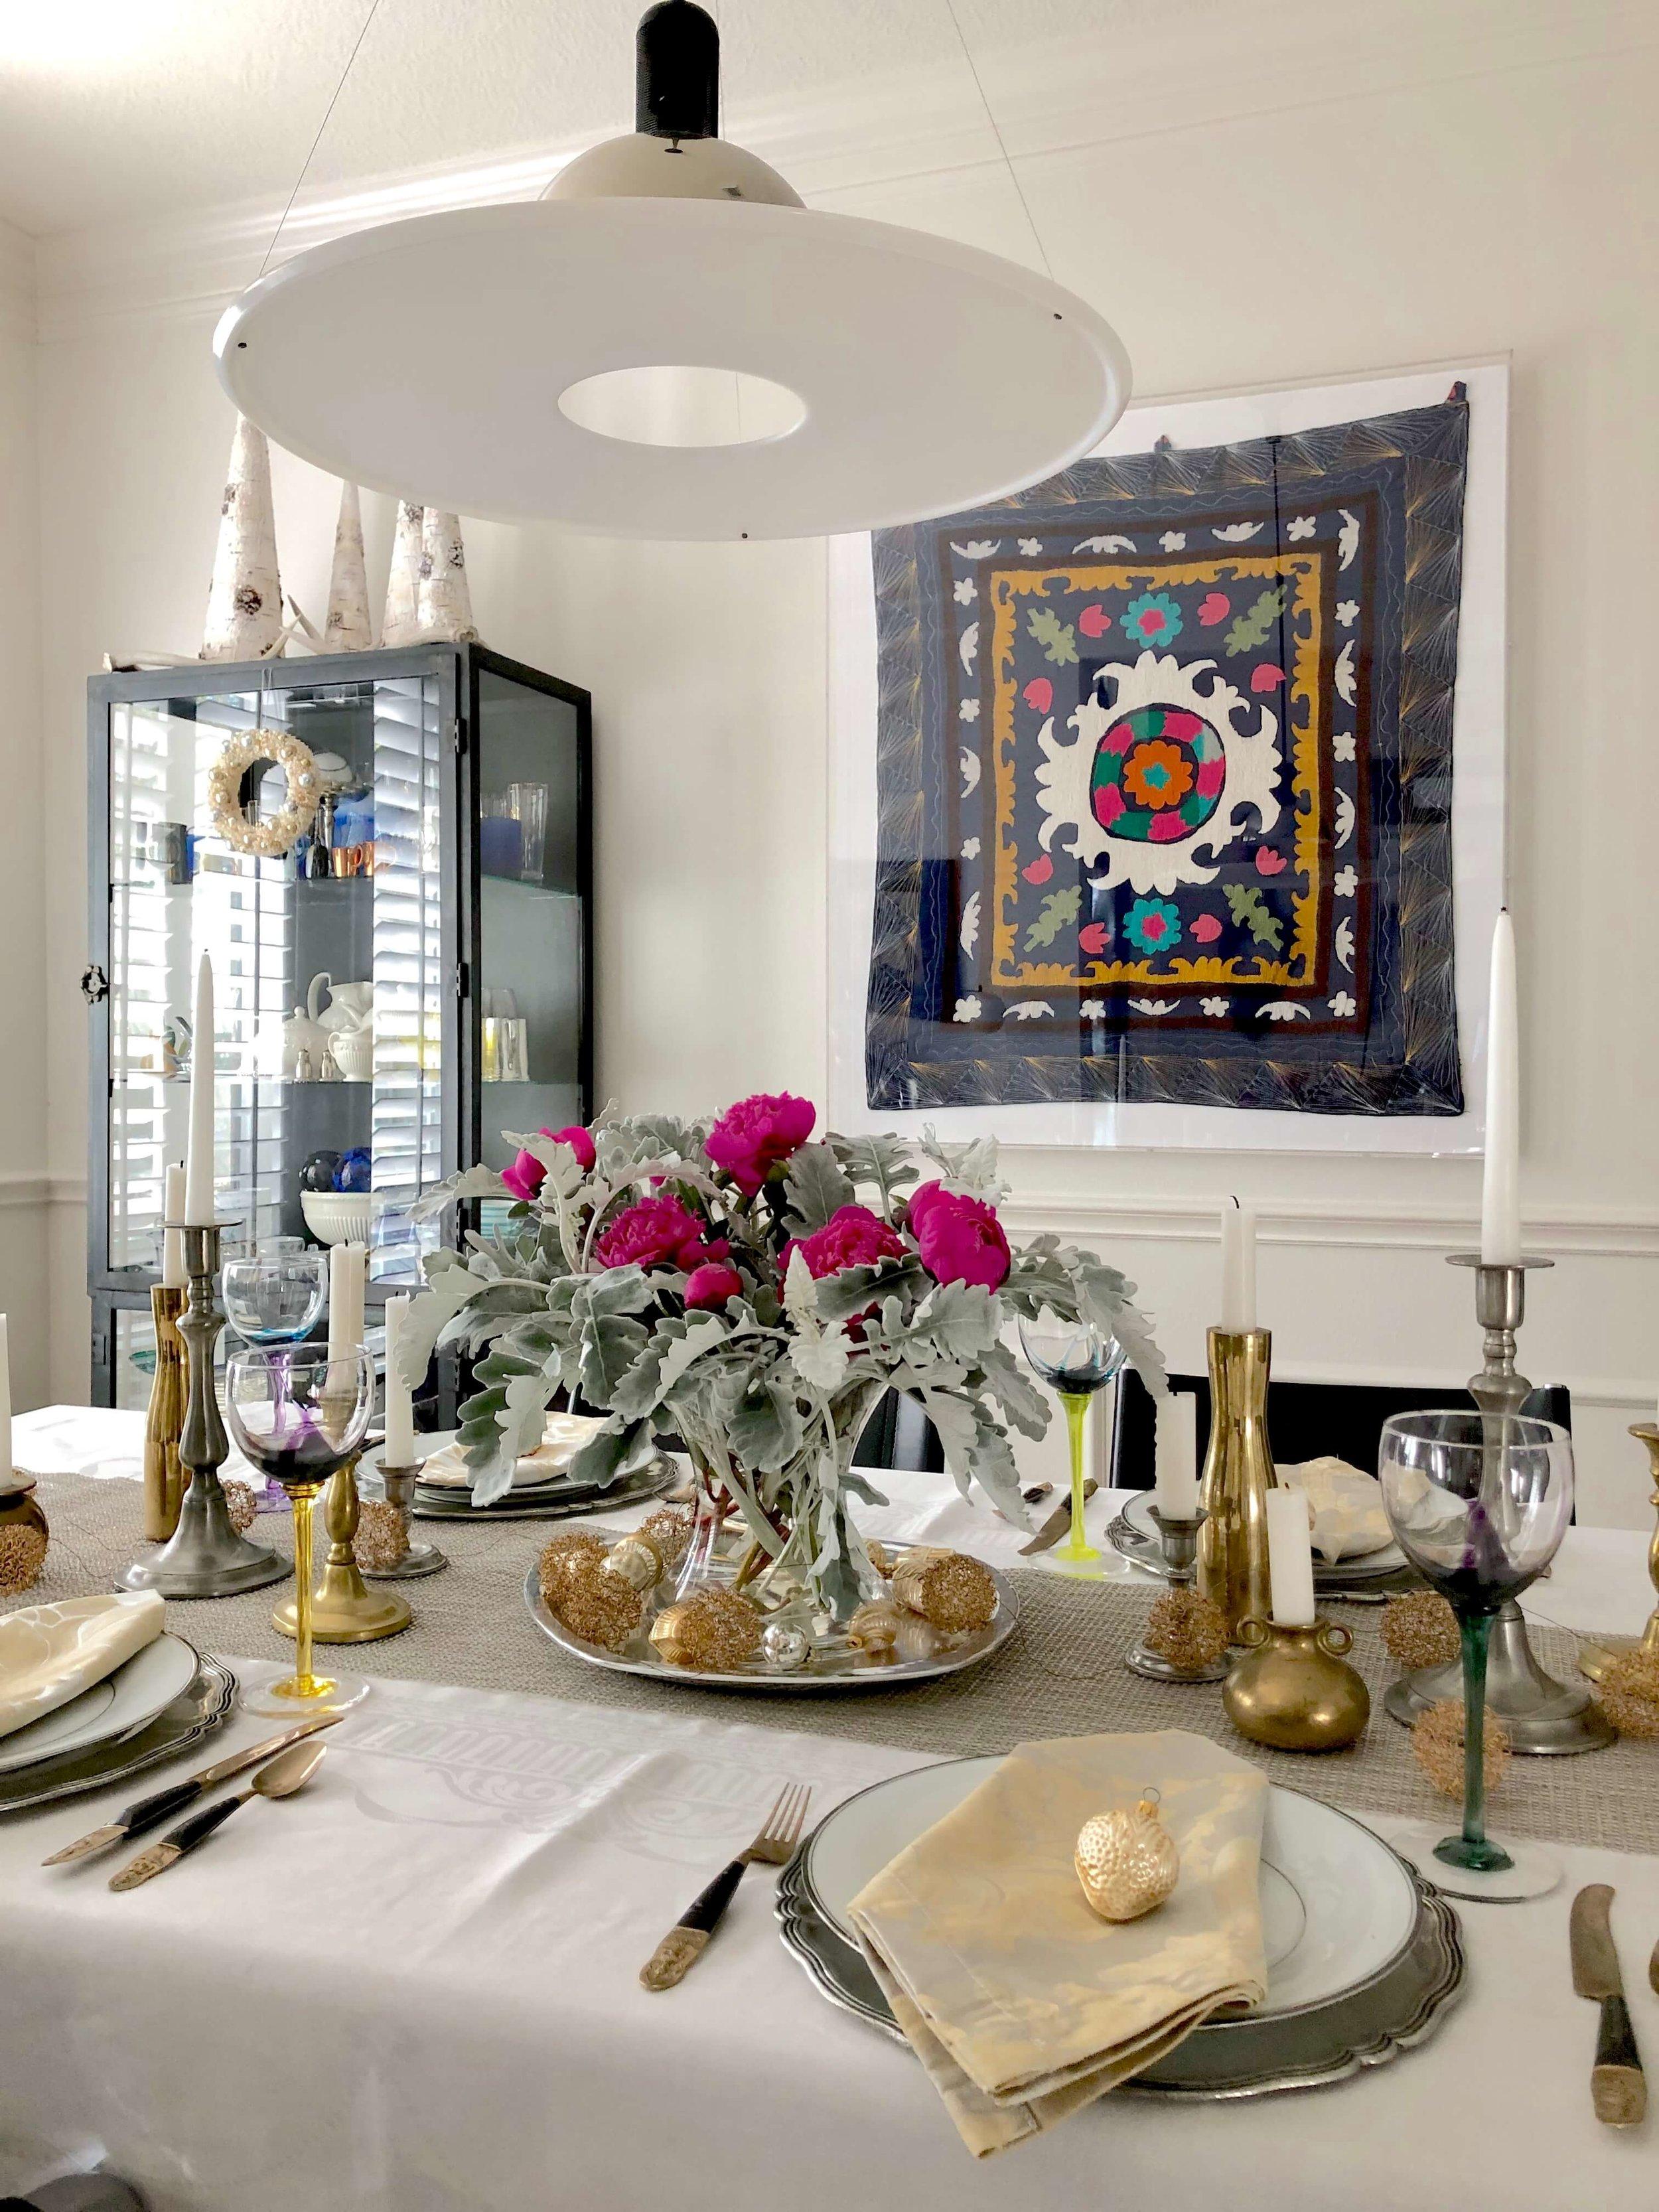 Tabletop with trending taper candles | Carla Aston Interior Designer, Tori Aston Photographer #tapercandles #candlesticks #interiordesigntrends #trending